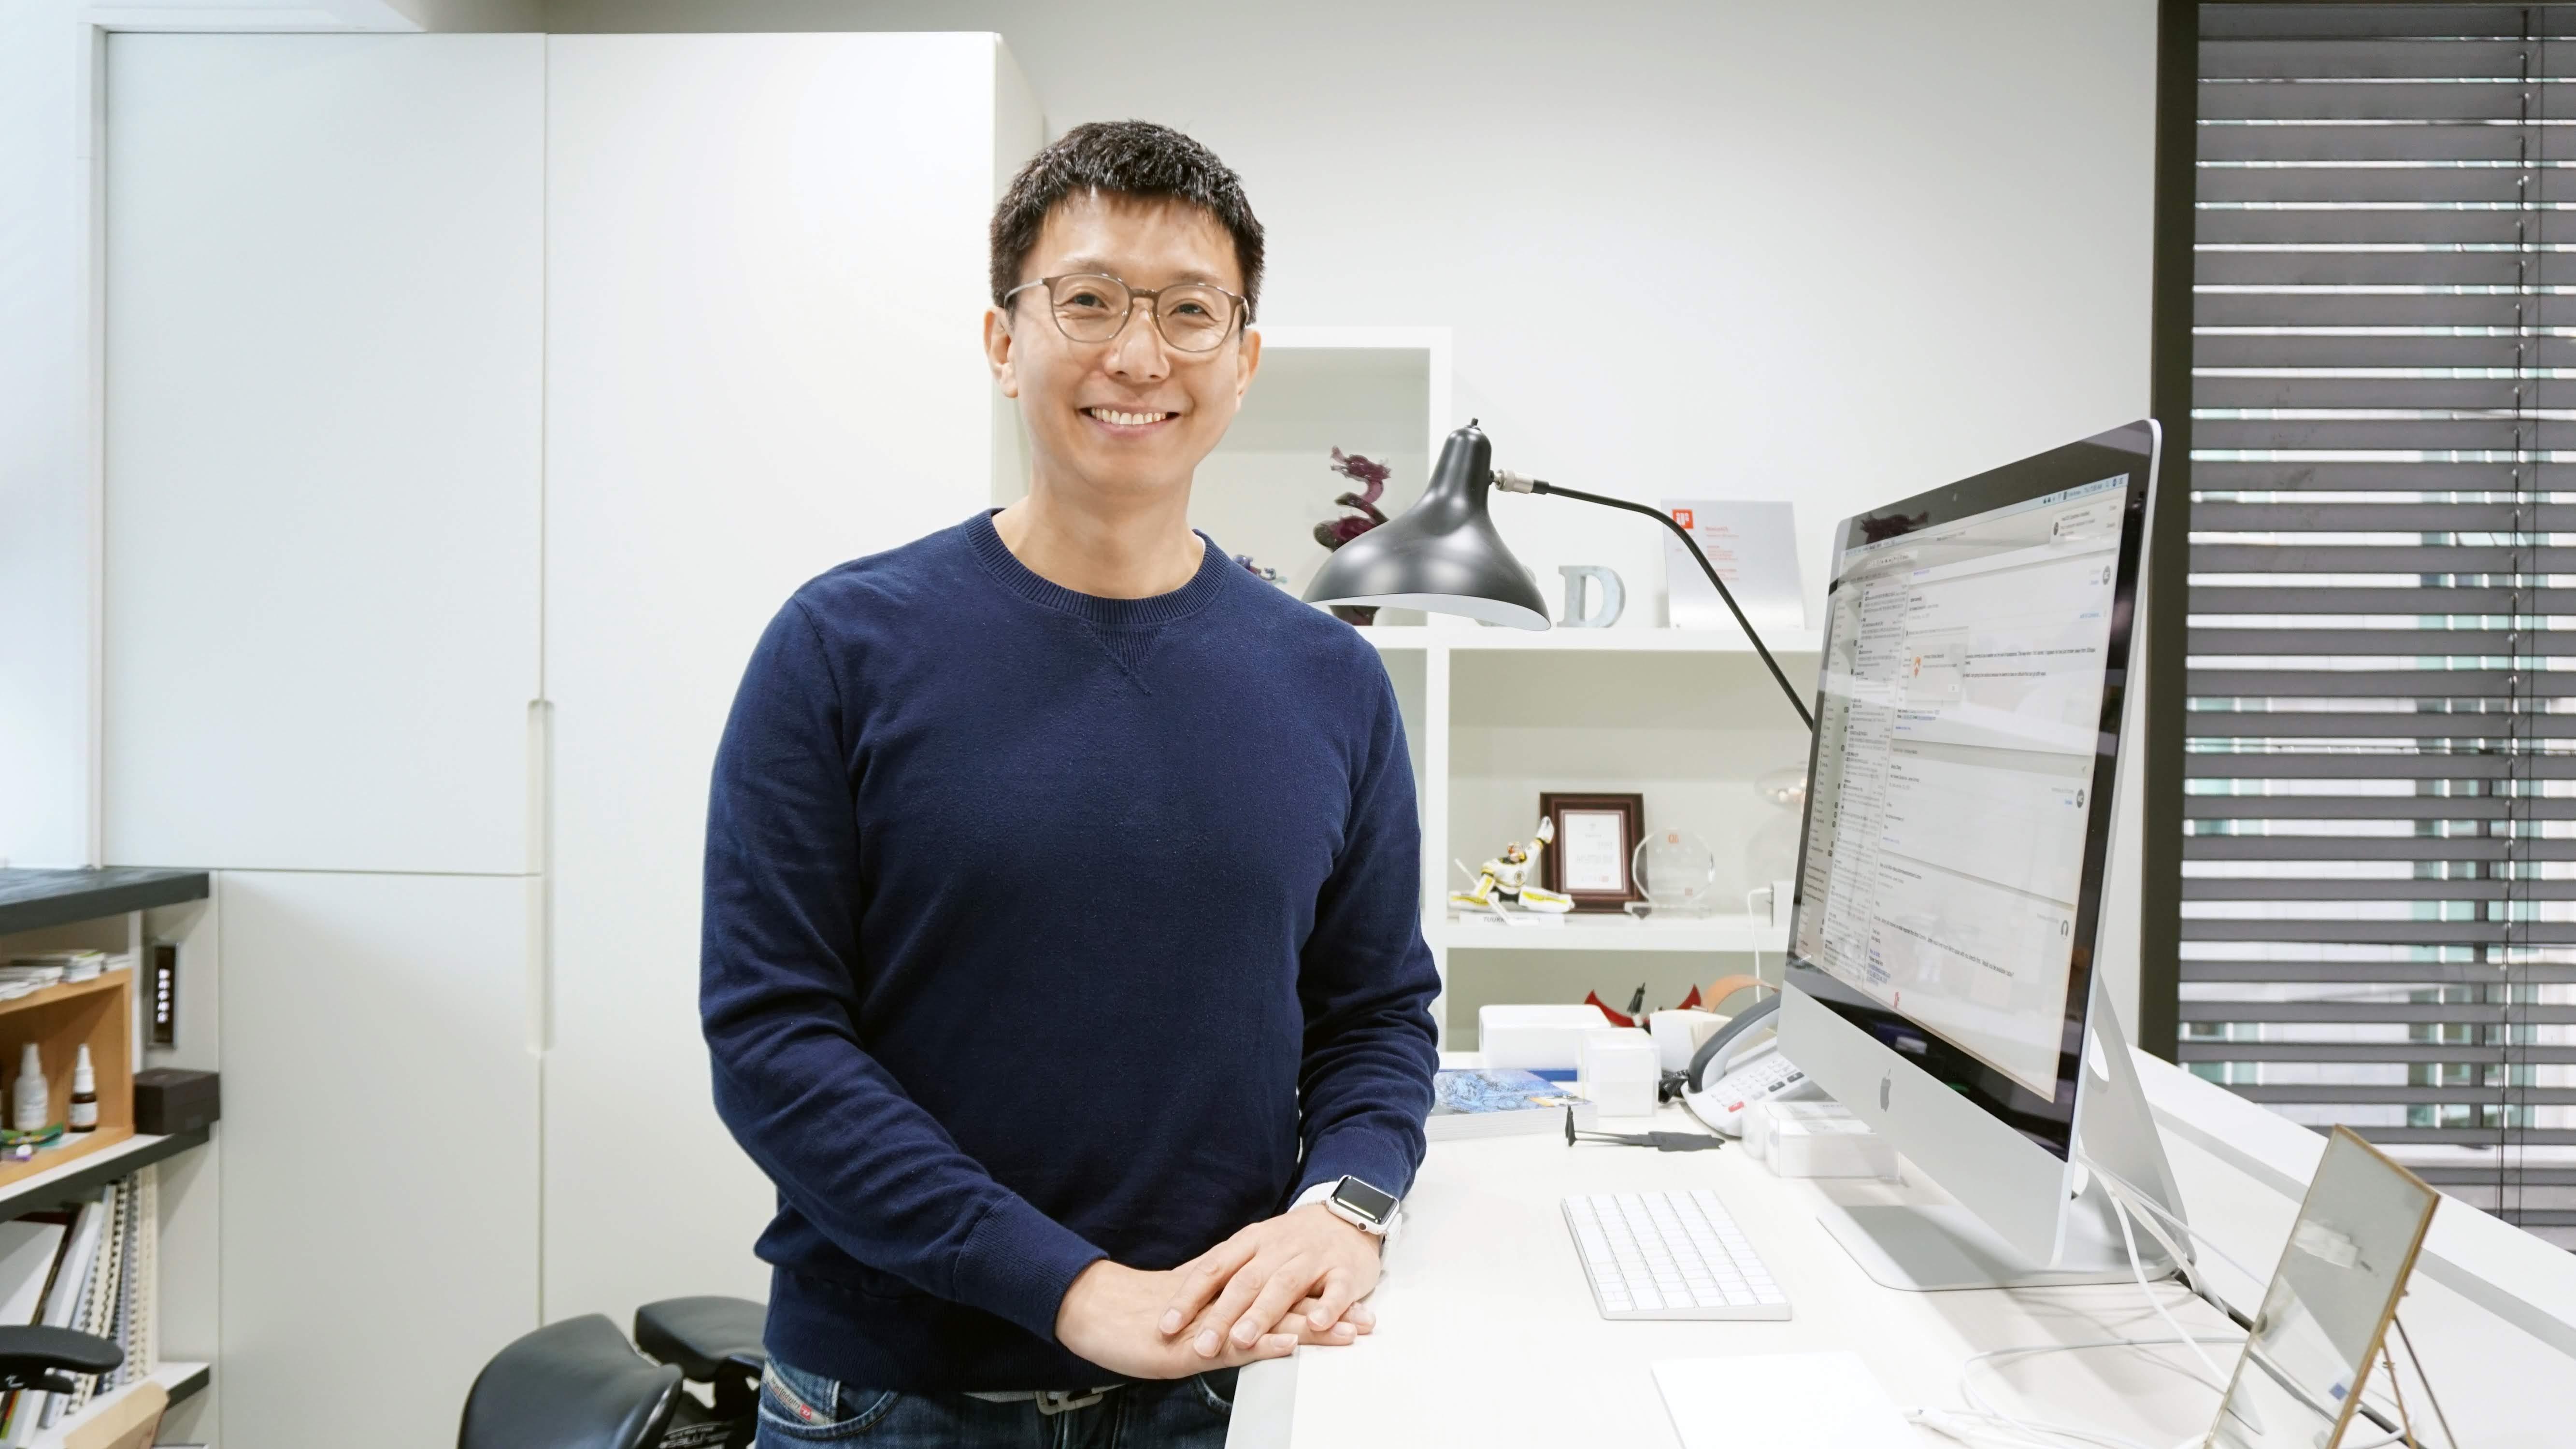 Meet Medit's Founder: Innovation that Makes Lives Easier (Part 2)